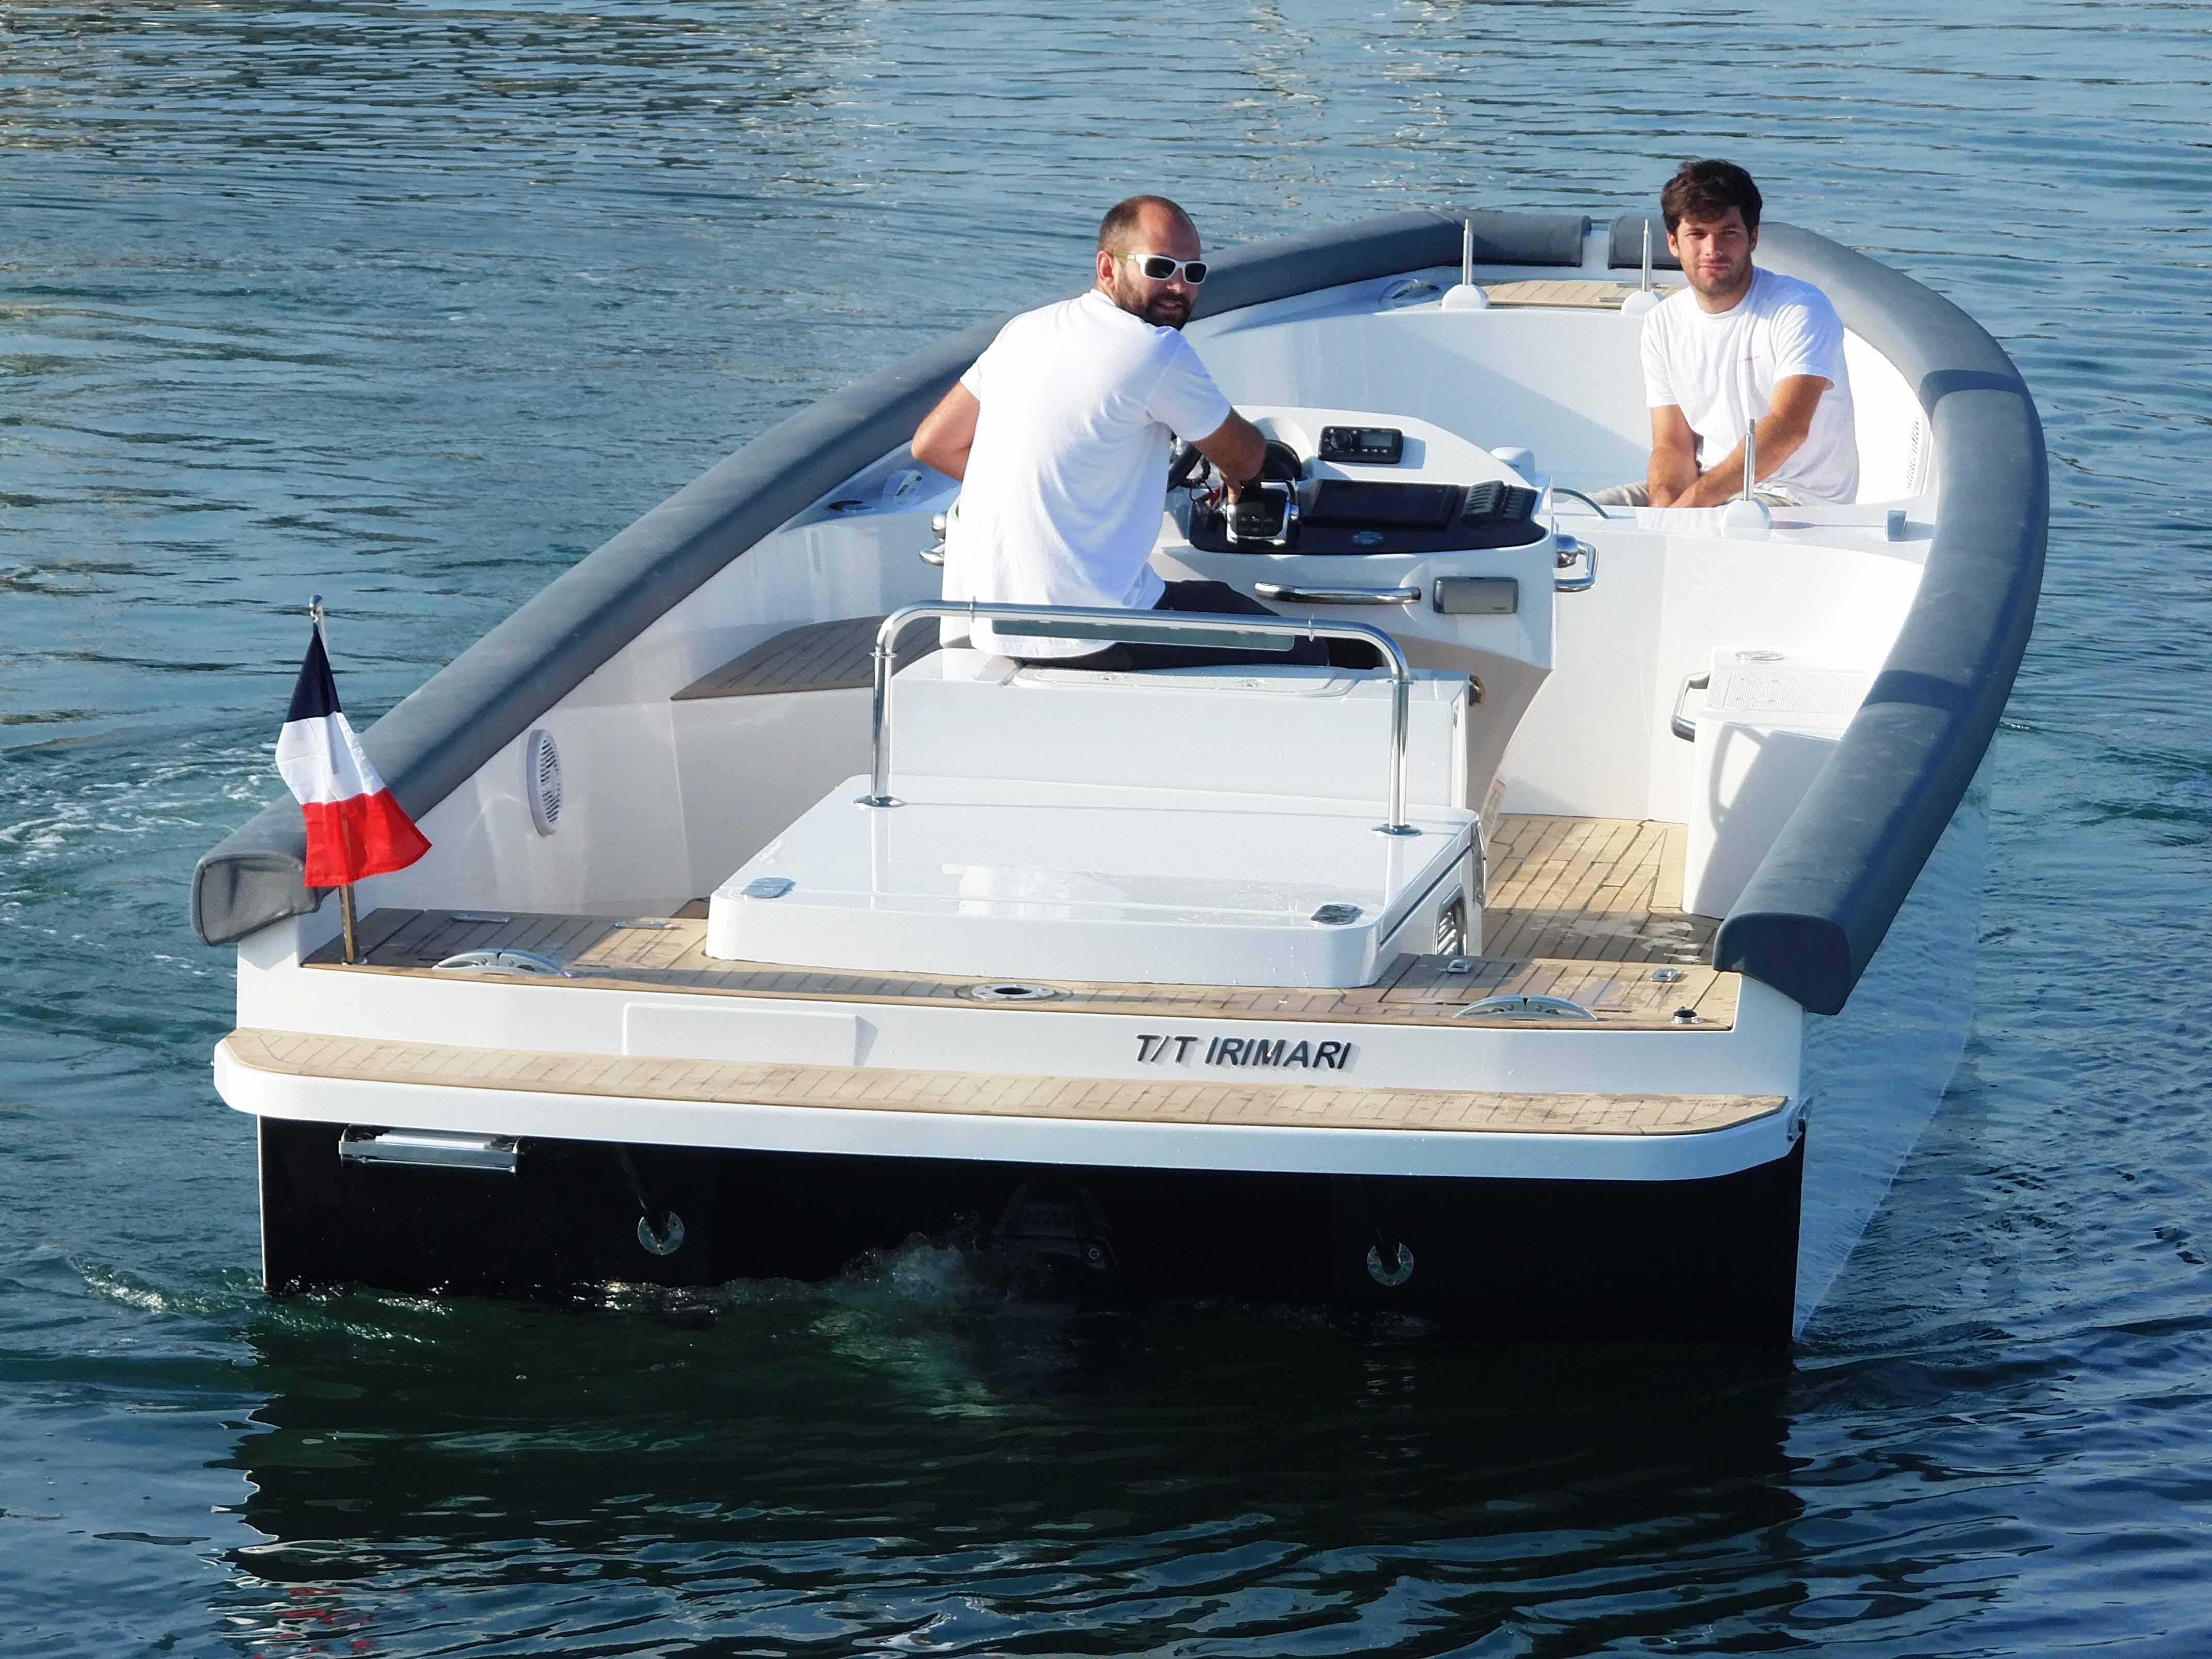 TS85 Open superyacht tedner for luxury yacht IRIMARI